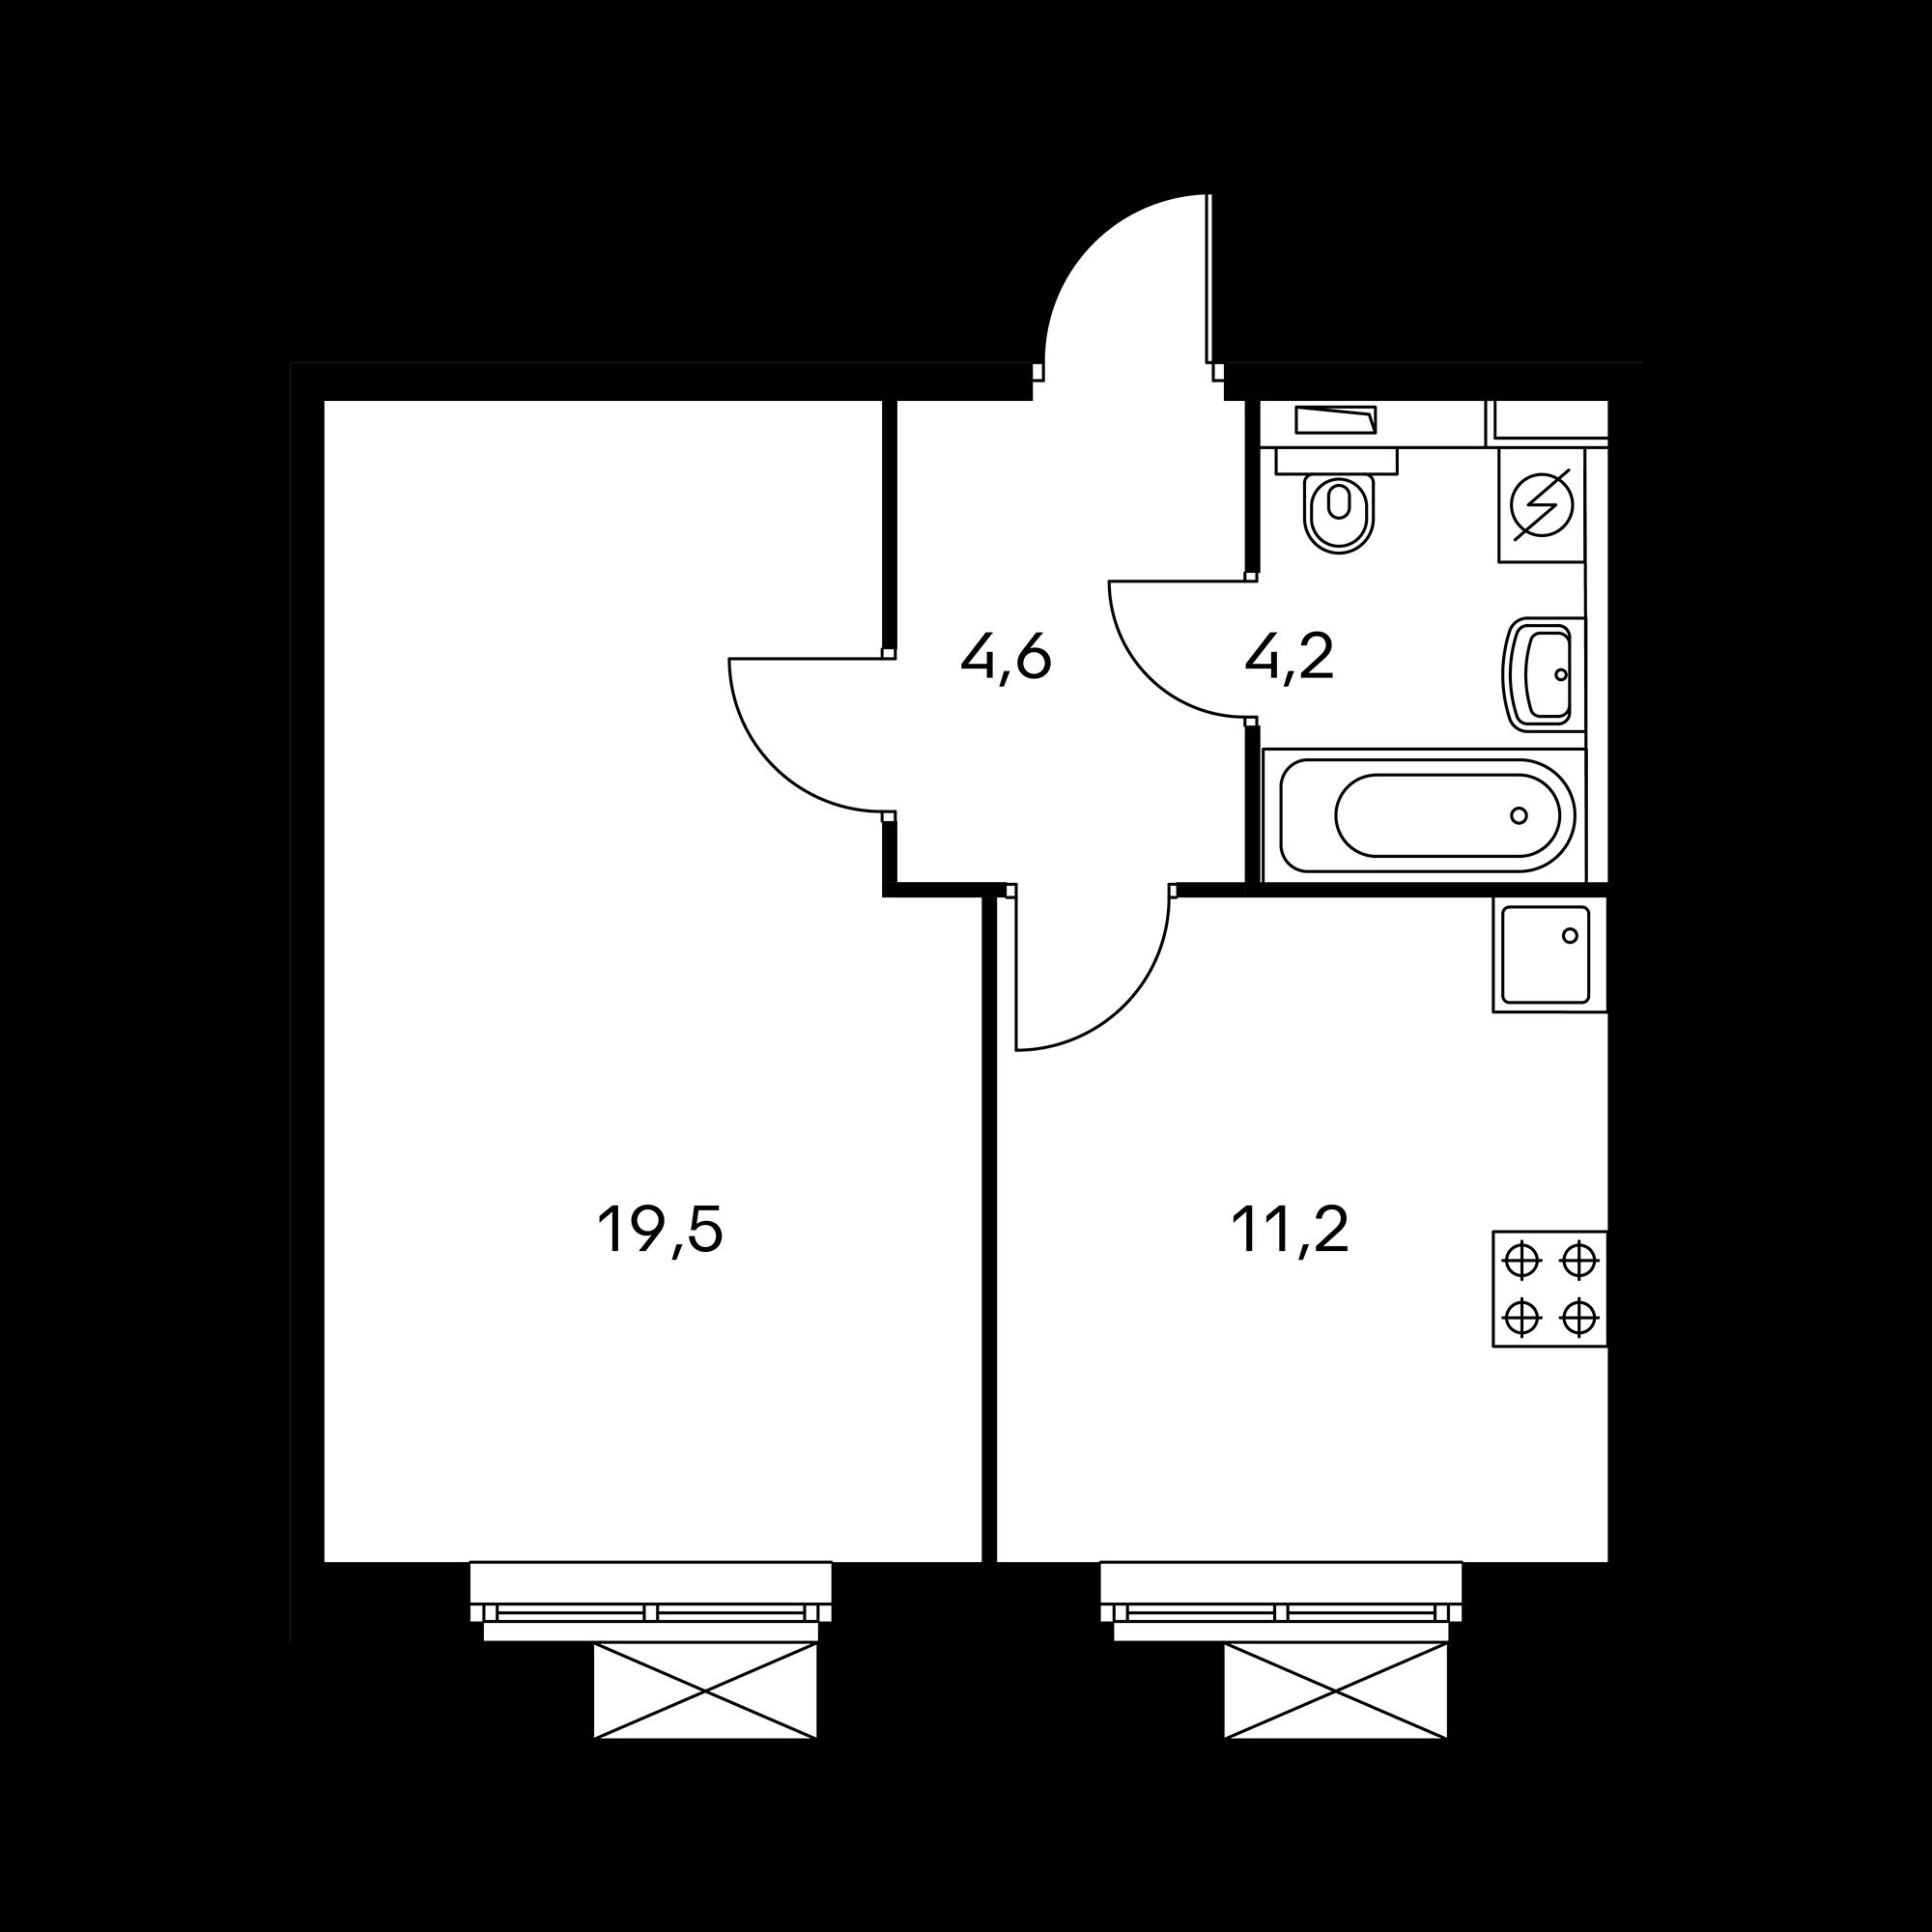 1KM2_6.9-2